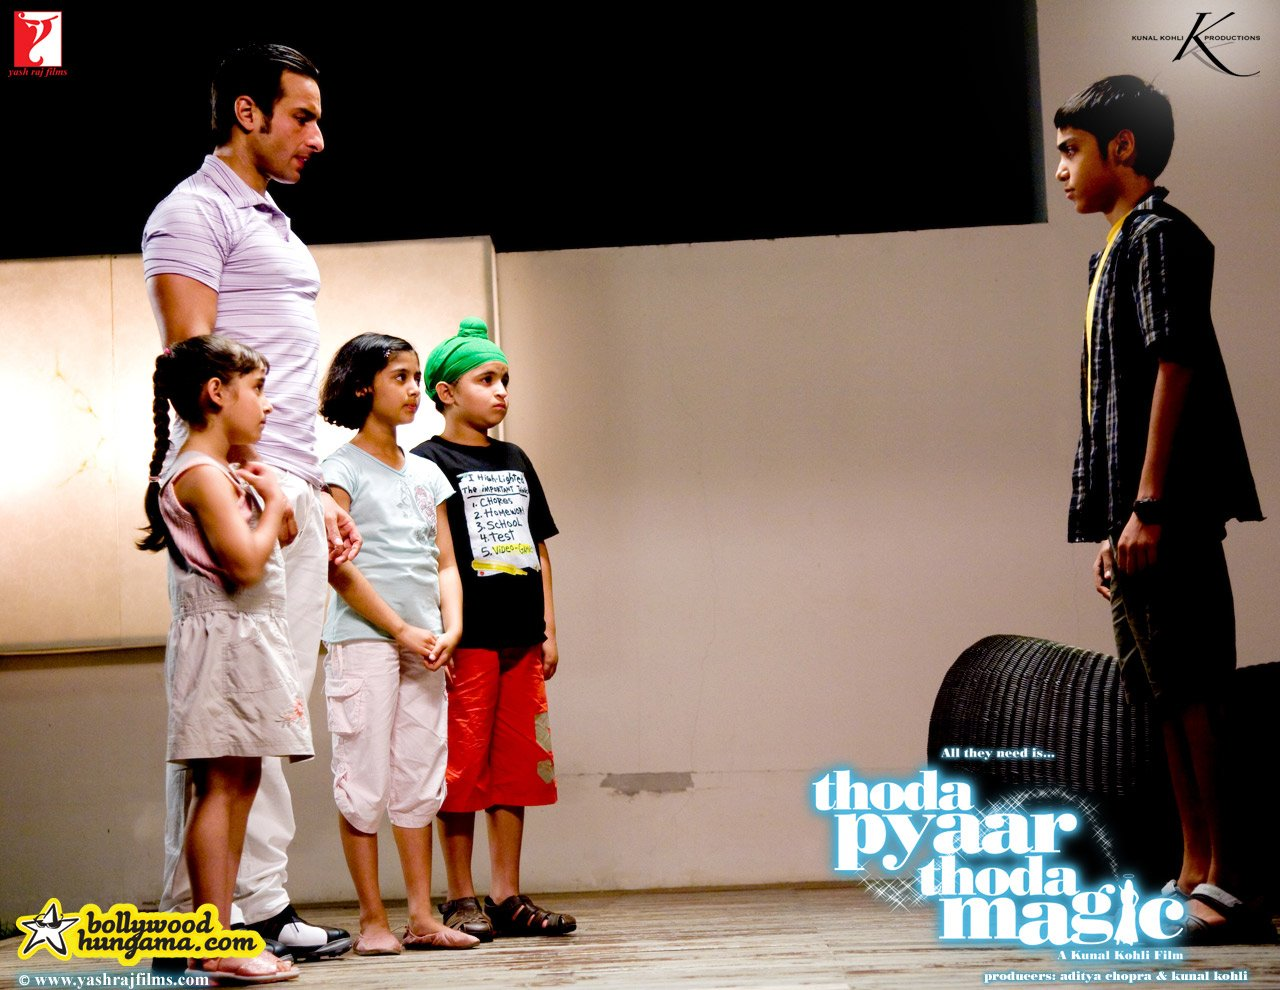 http://i.indiafm.com/posters/movies/08/thodapyaarthodamagic/still28.jpg